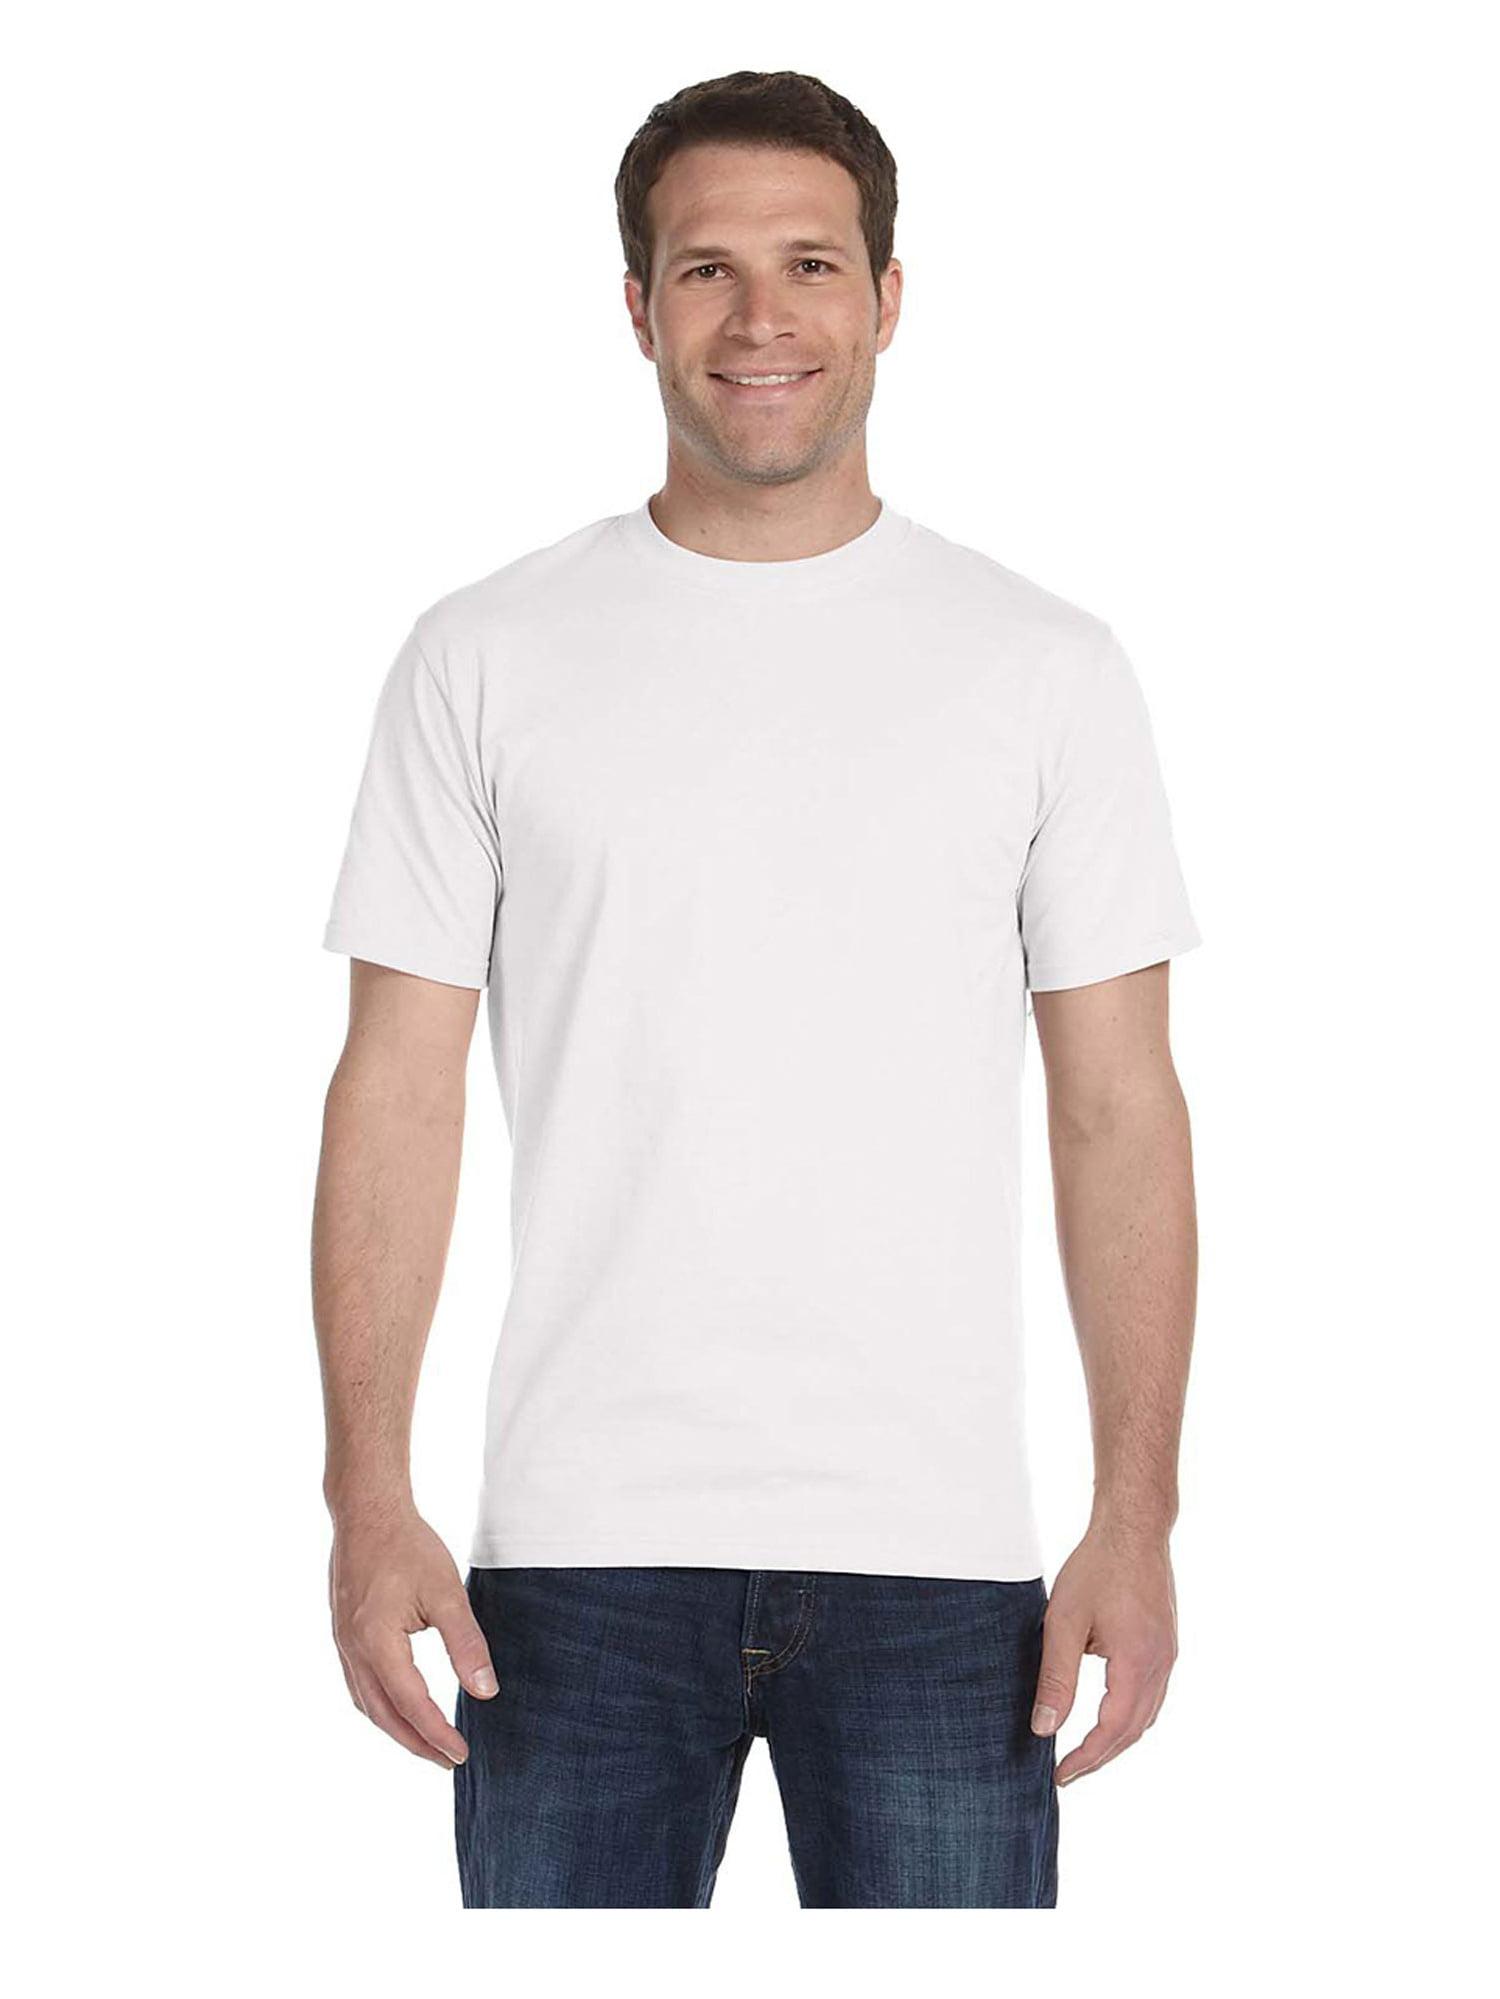 Gildan Men's Dryblend Moisture Wicking 7/8 Inch T-Shirt, Style G8000